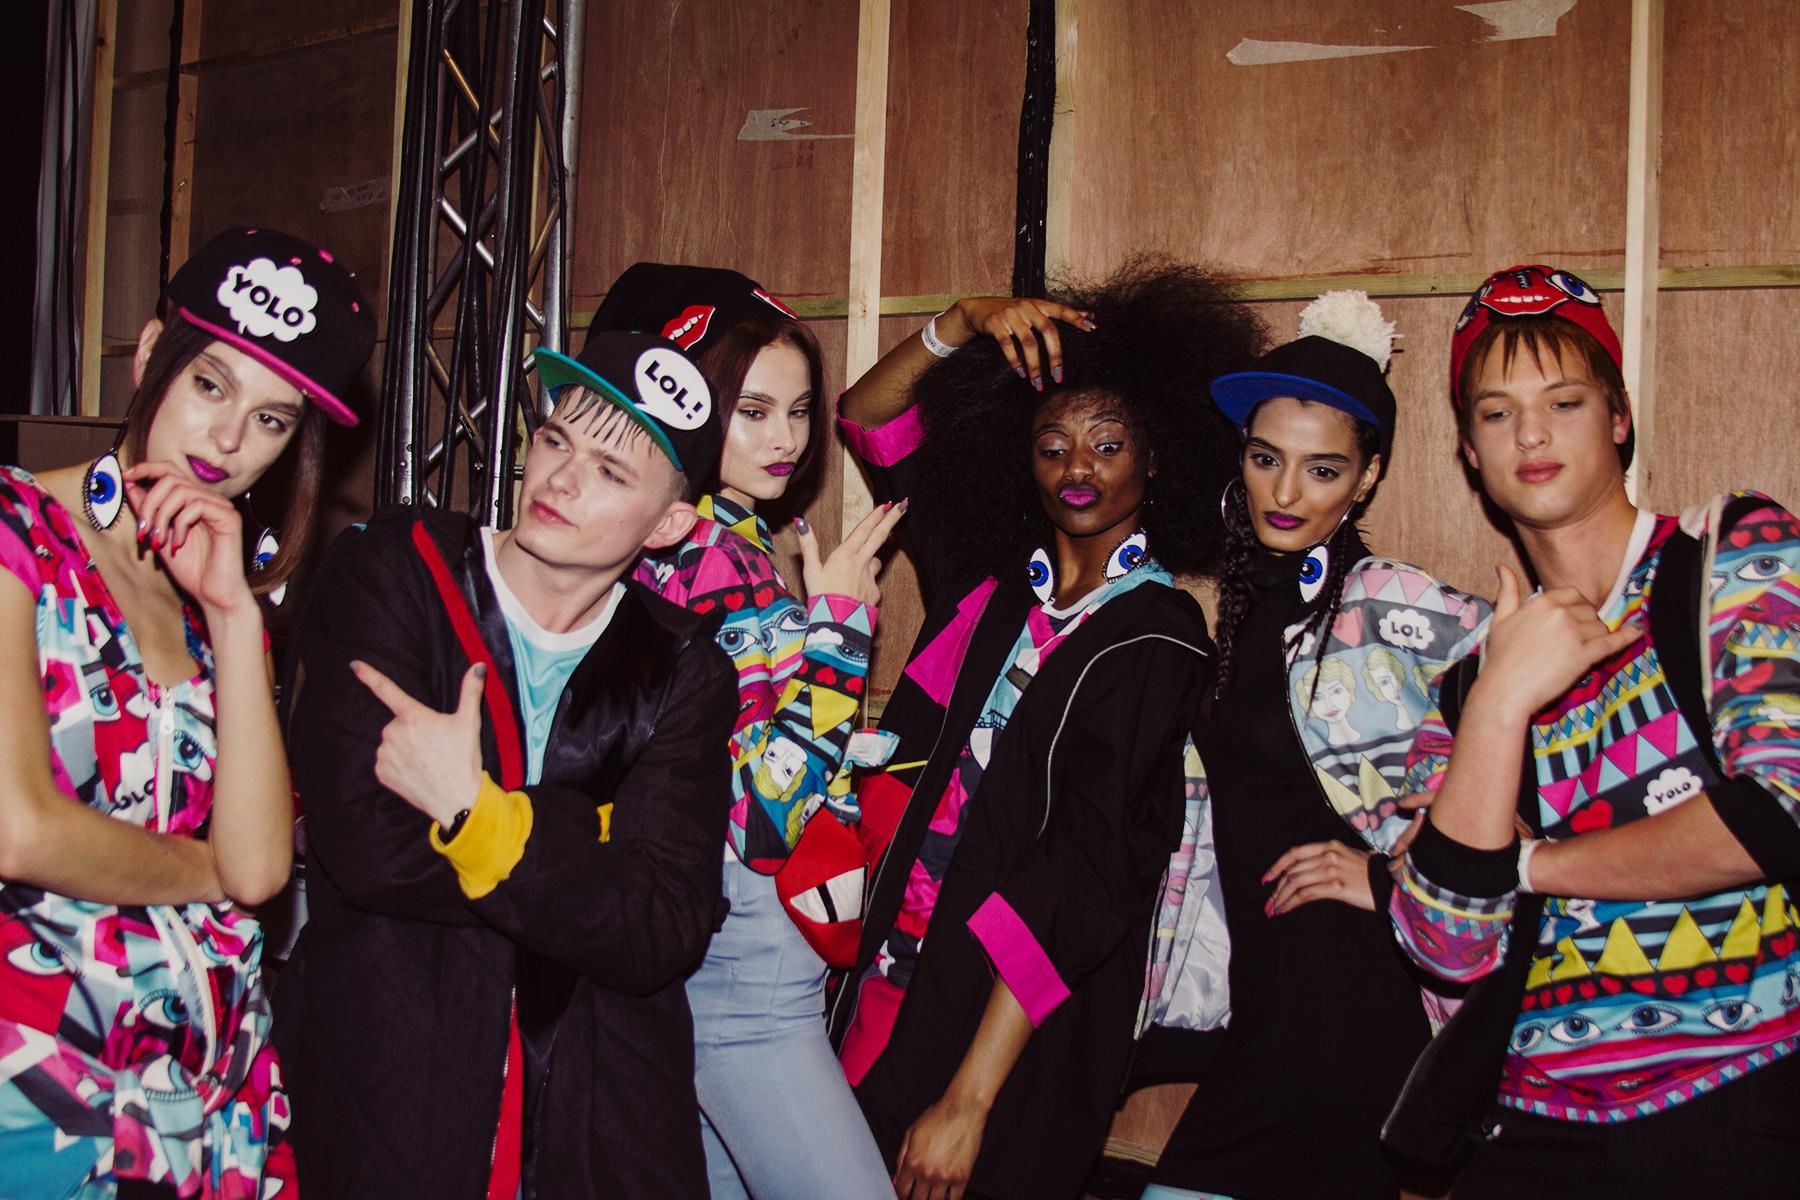 Backstage at London Fashion Week | Wallpaper*